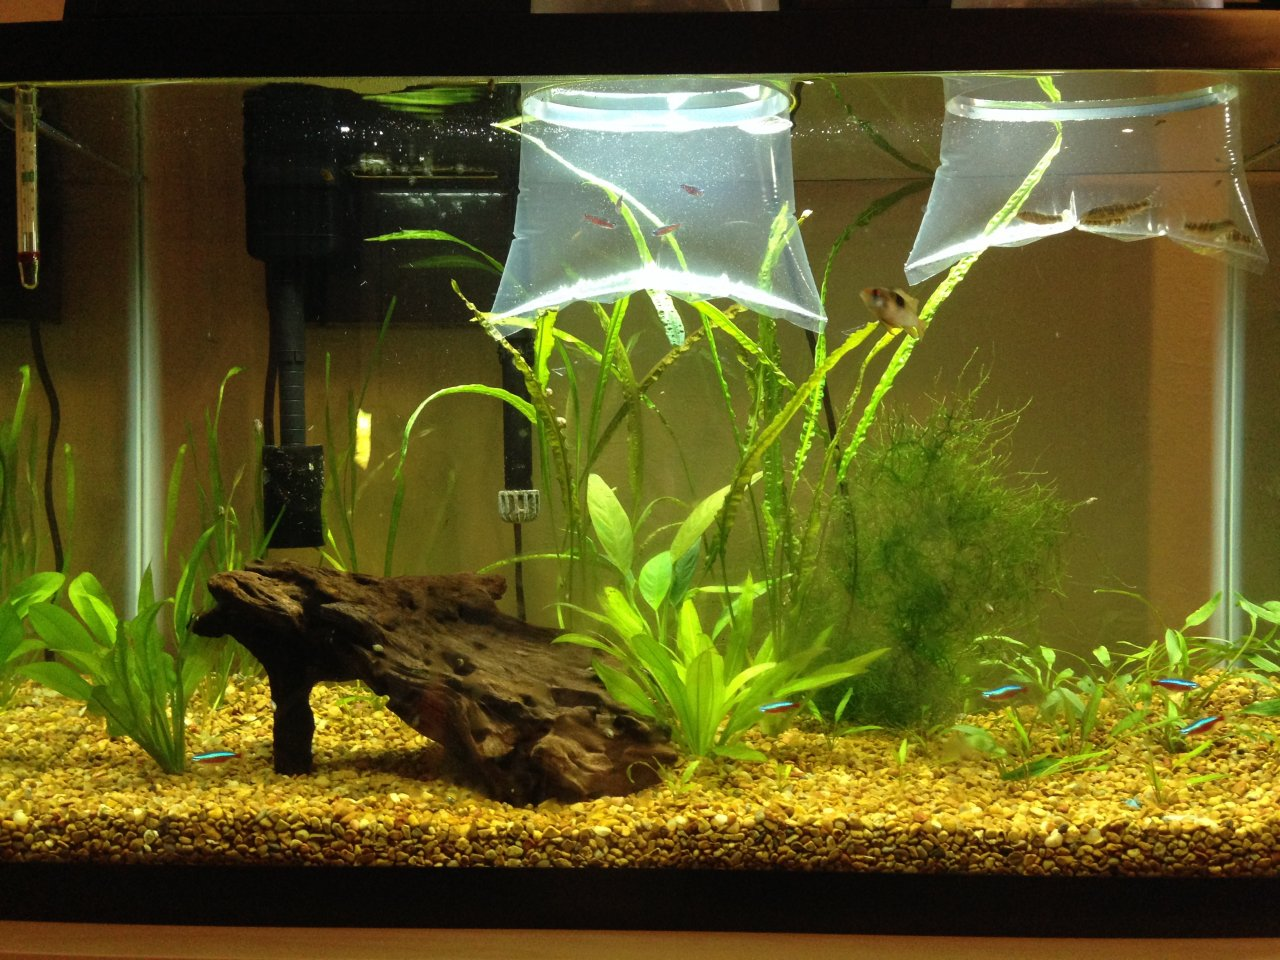 30 gallon community tank my aquarium club for 10 gallon fish tank stocking ideas